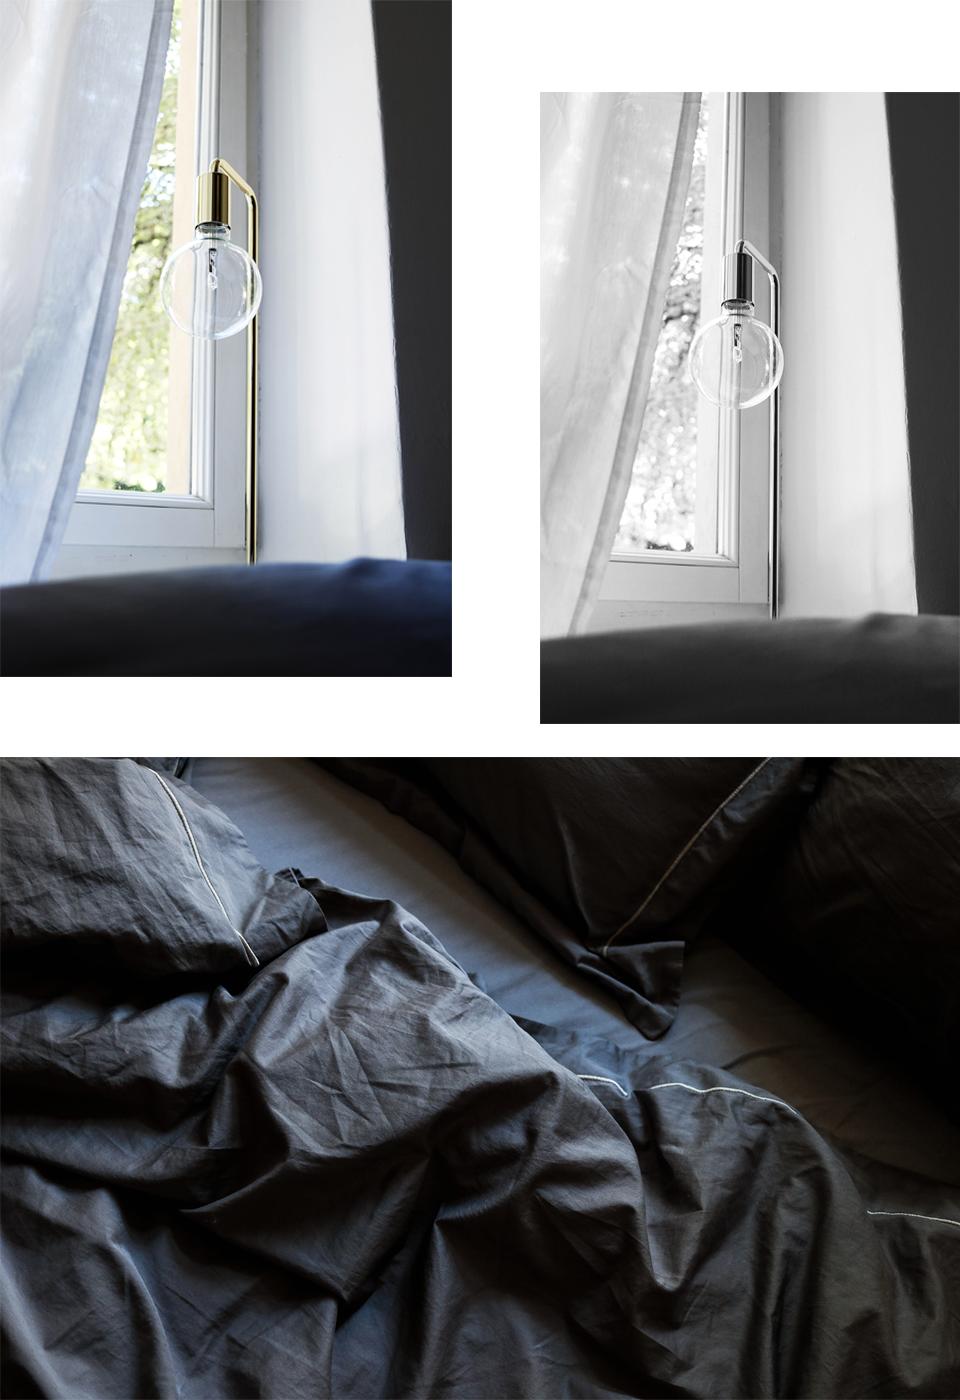 noa-noir-art-interior-minimal-home-inspiration-urbanara-minimalist-bedroom-1 (1).png